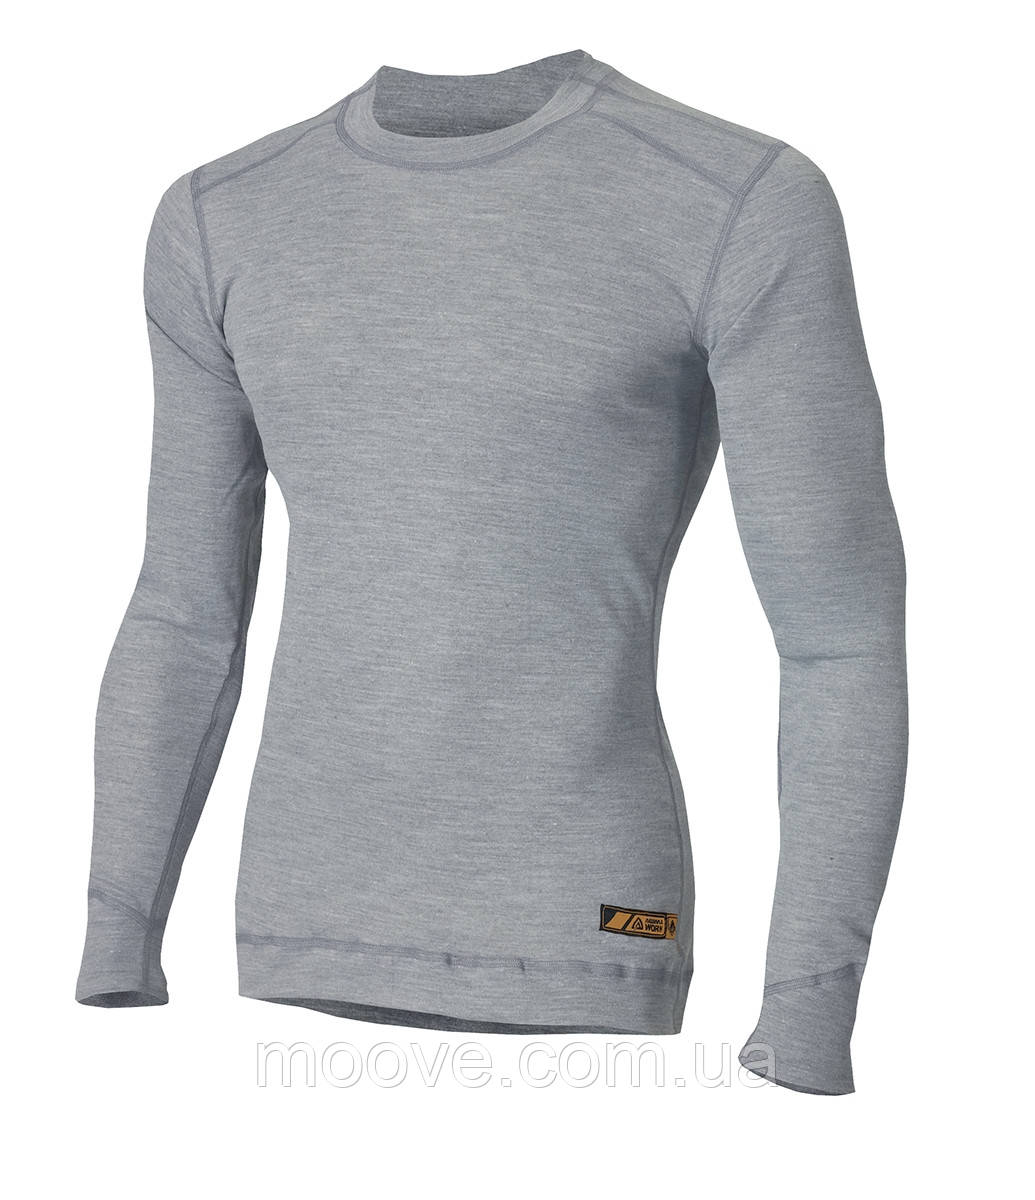 Aclima Work X-Safe Shirt Crew Neck L grey melange